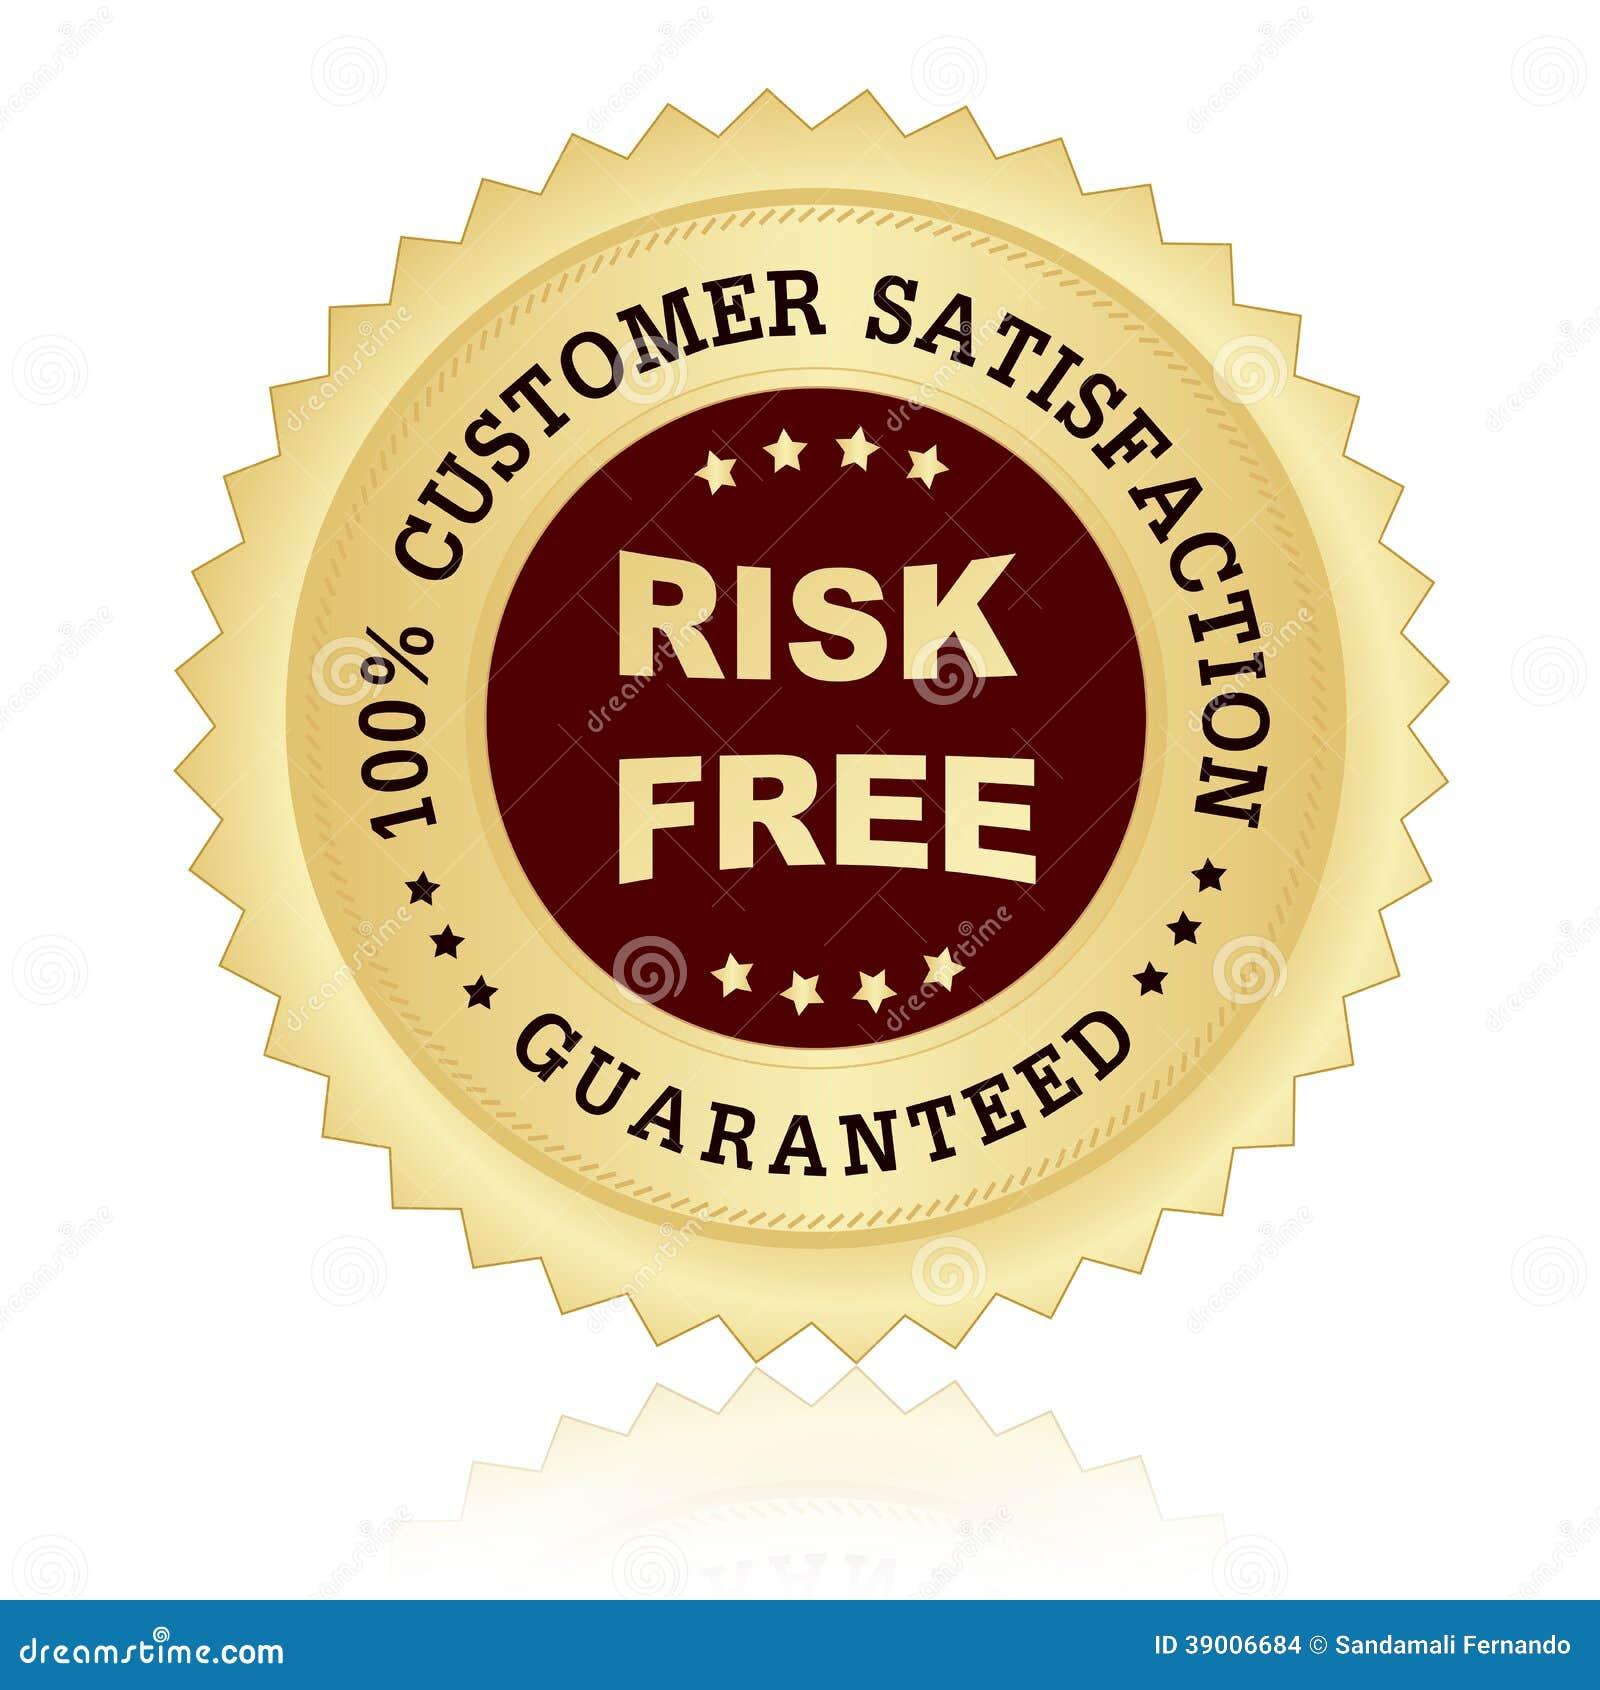 Guarantee free online dating